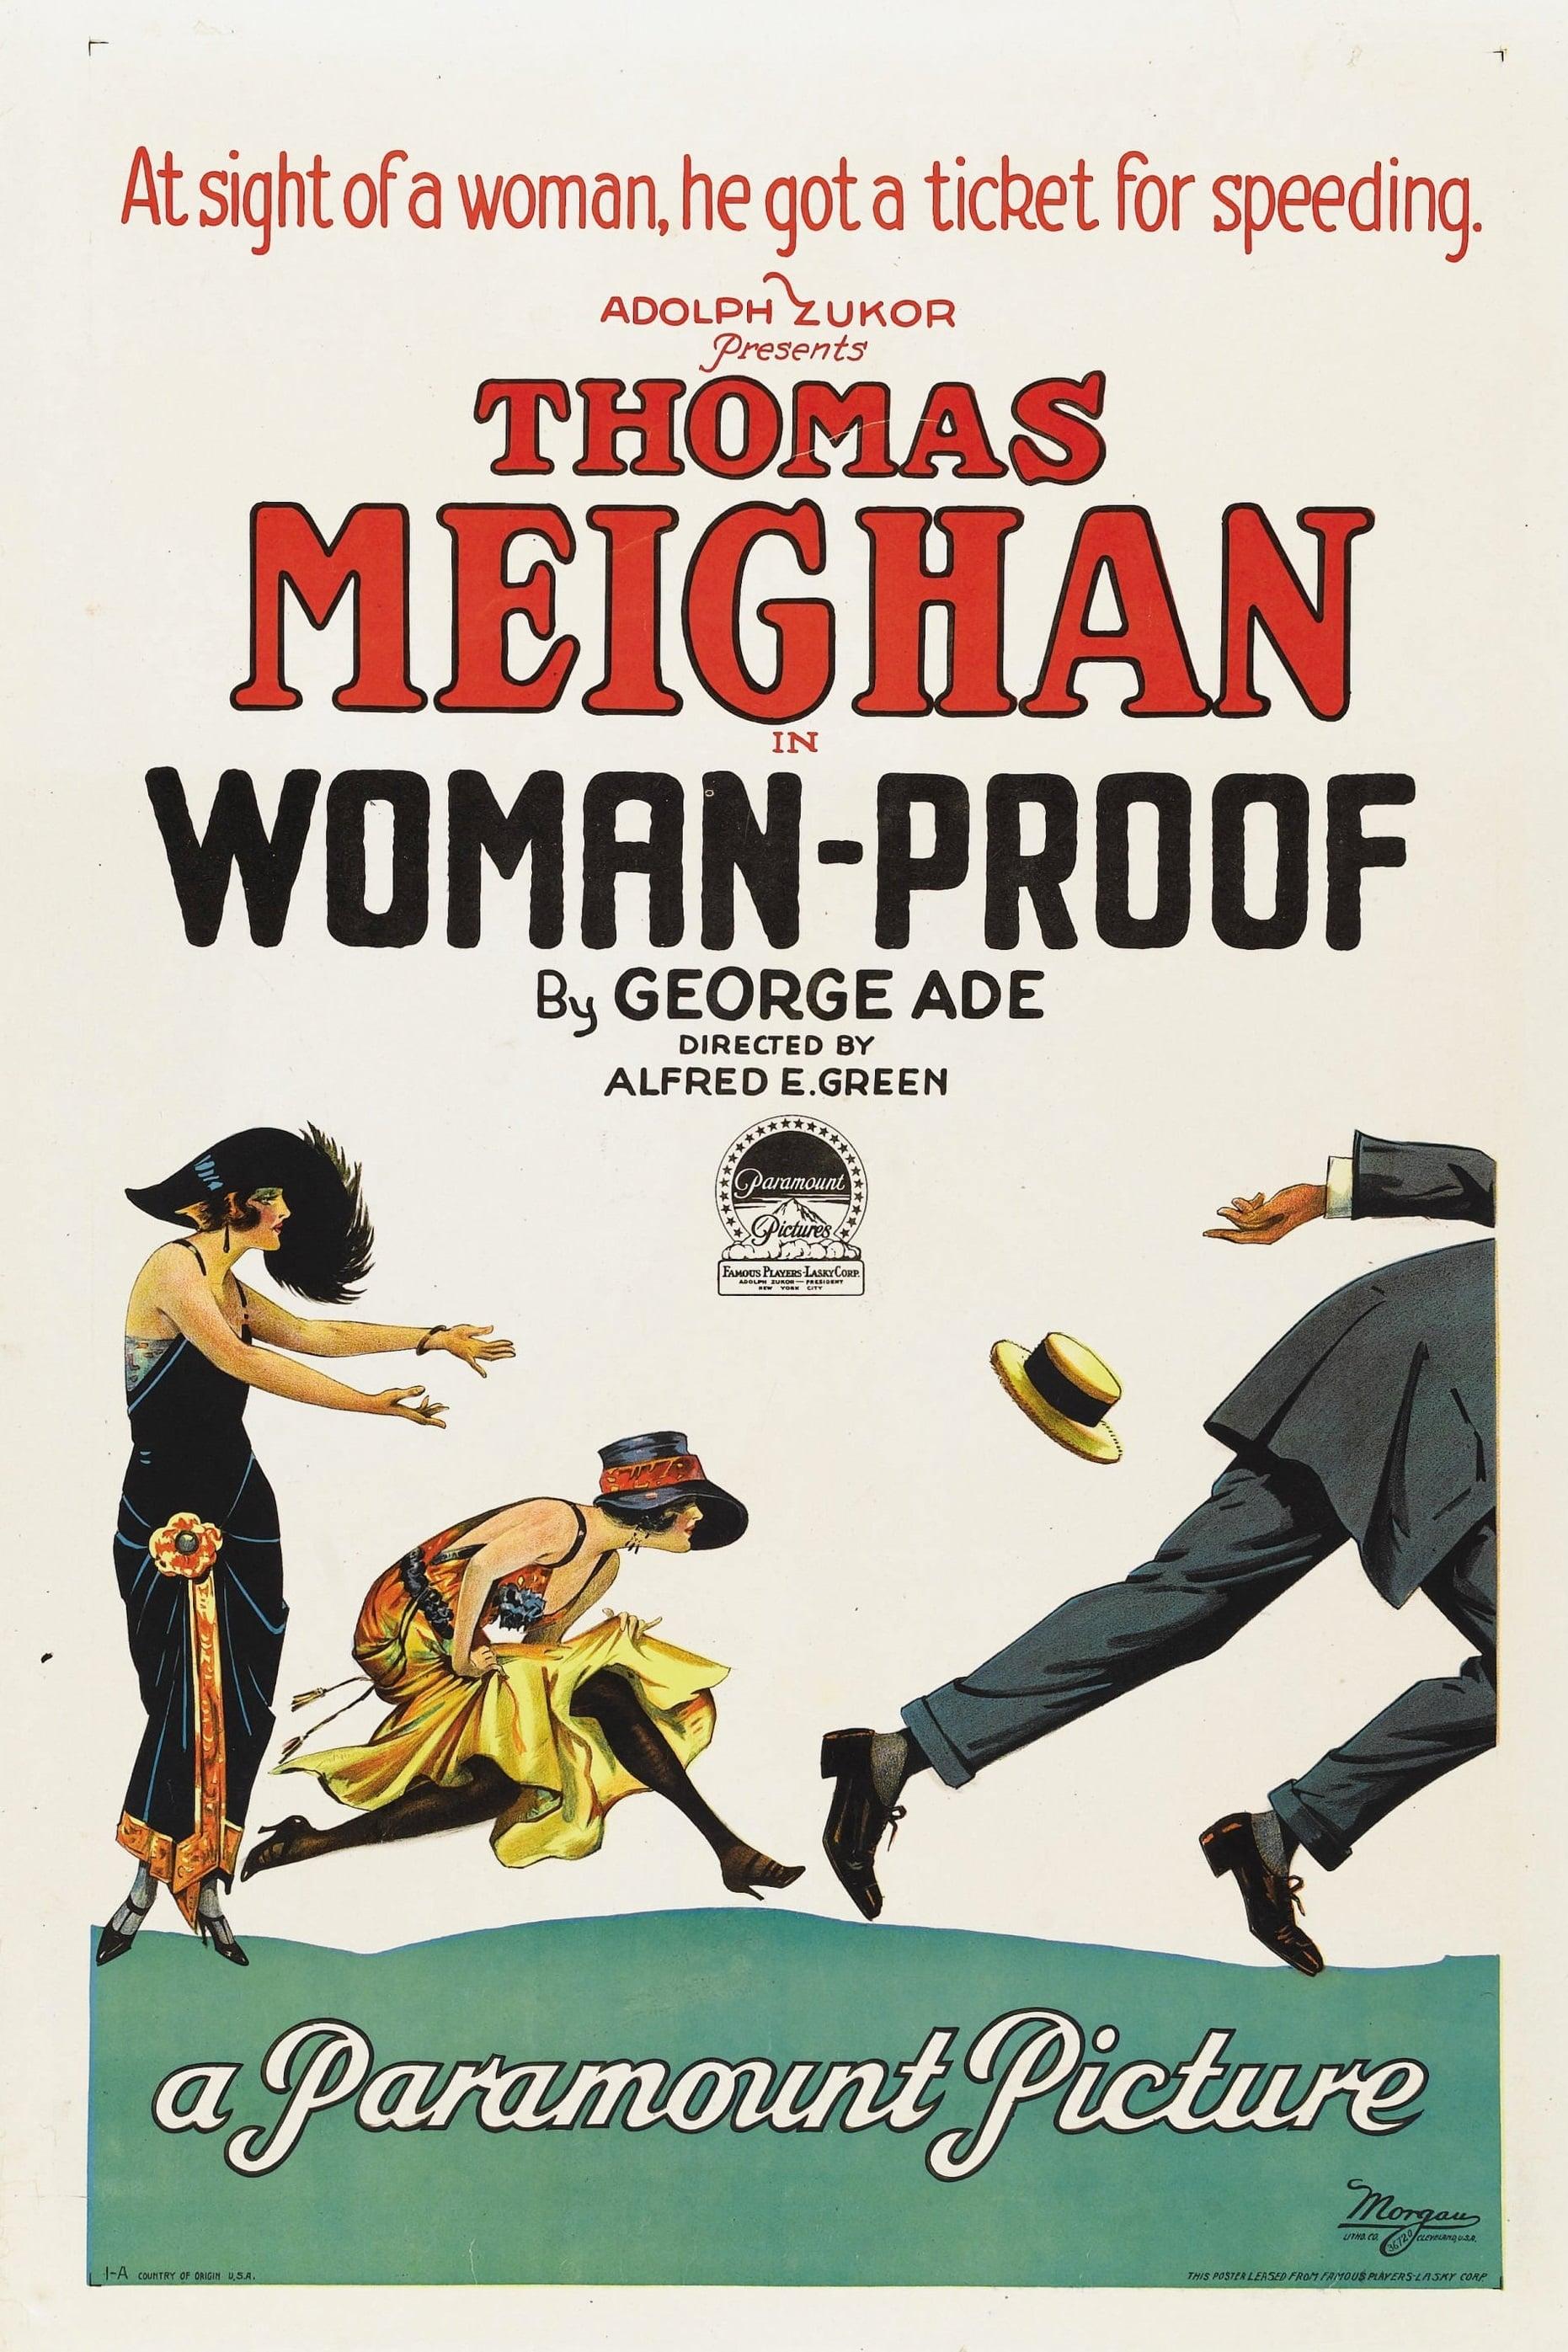 Woman-Proof